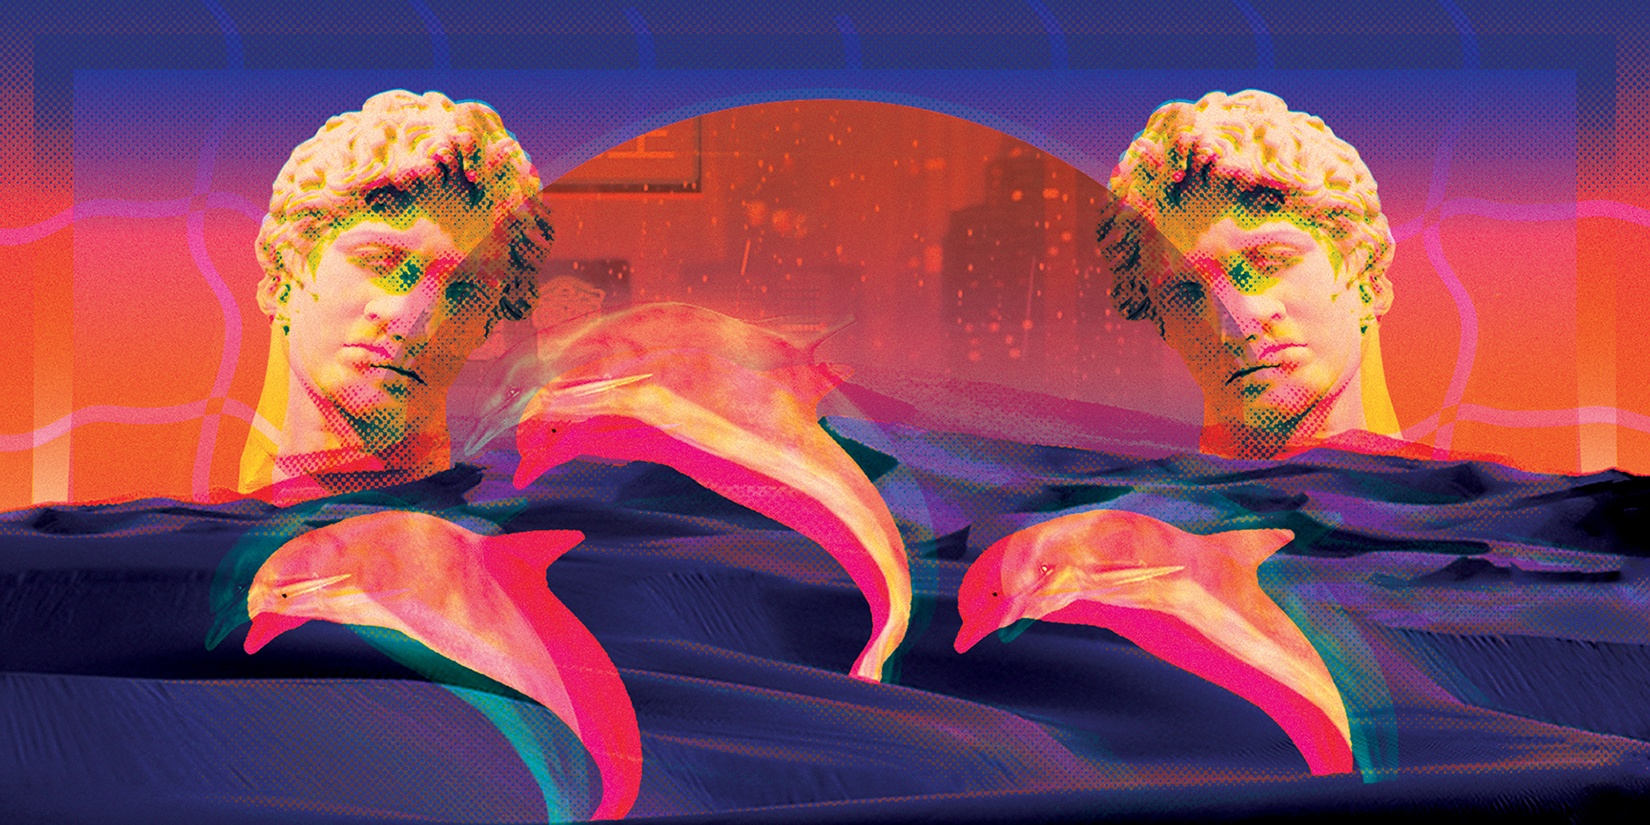 Vaporwave: subversive dream music for the post-Internet age